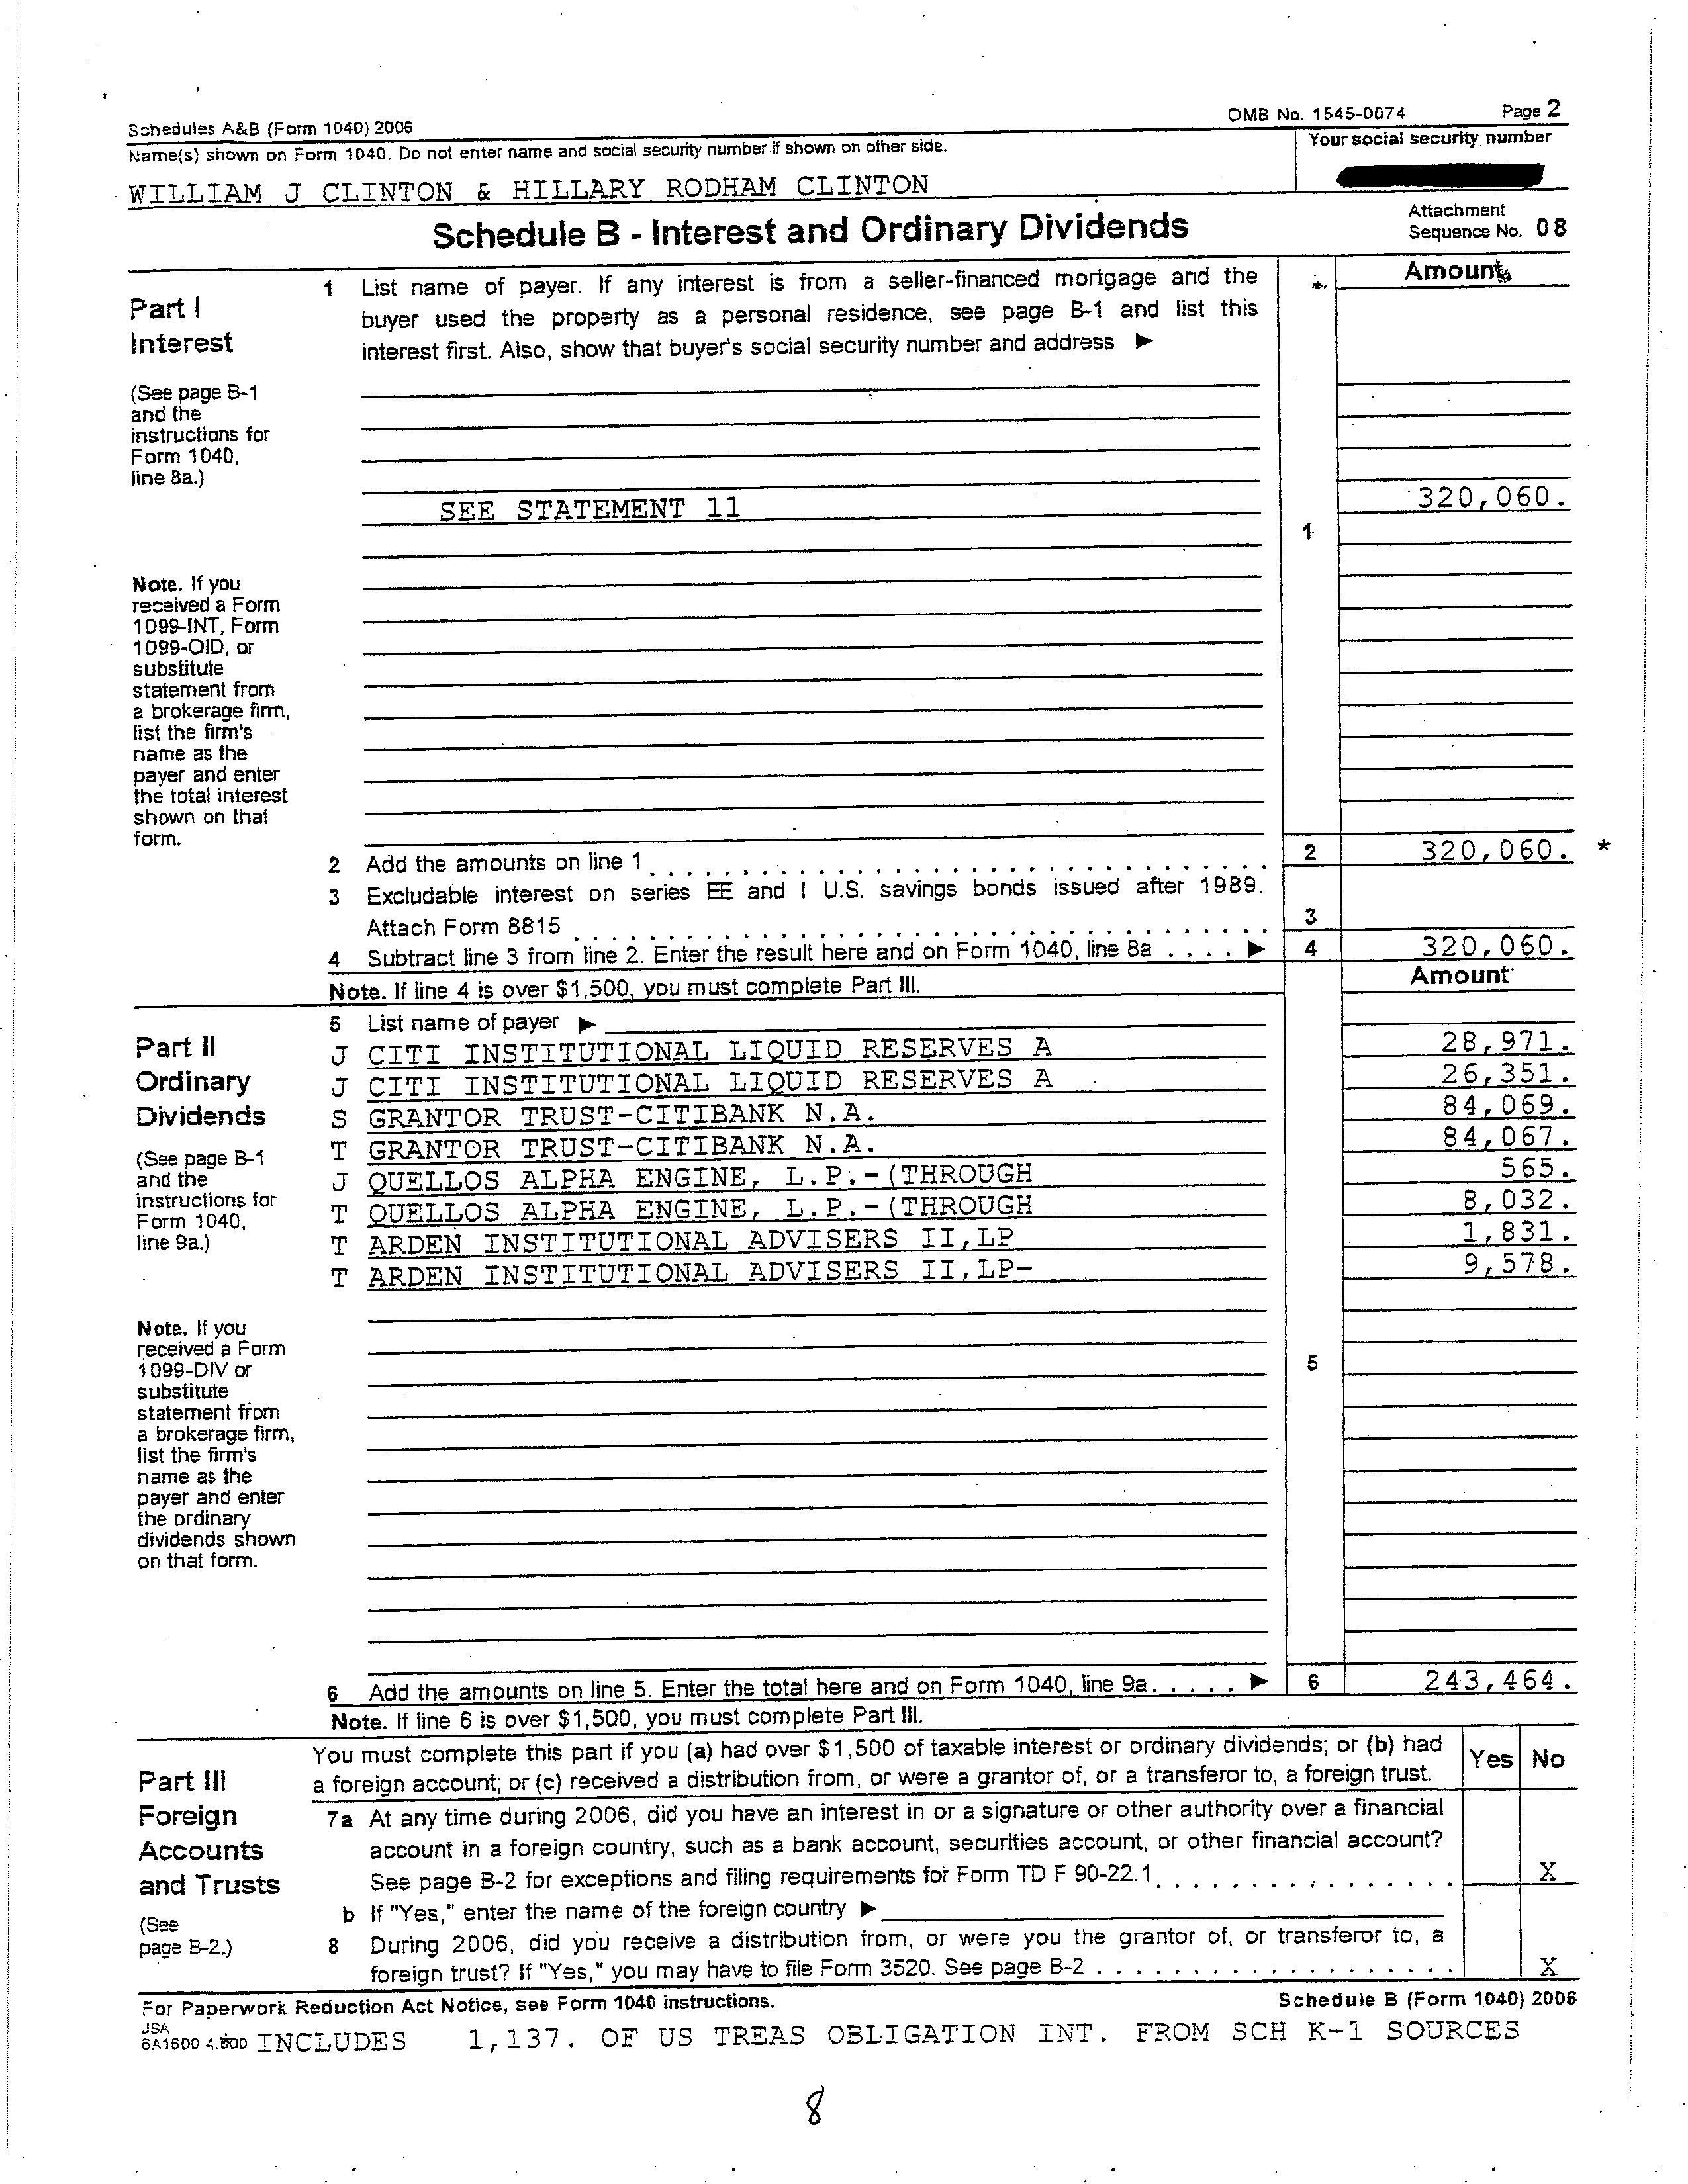 2006 Us Individual Income Tax Return